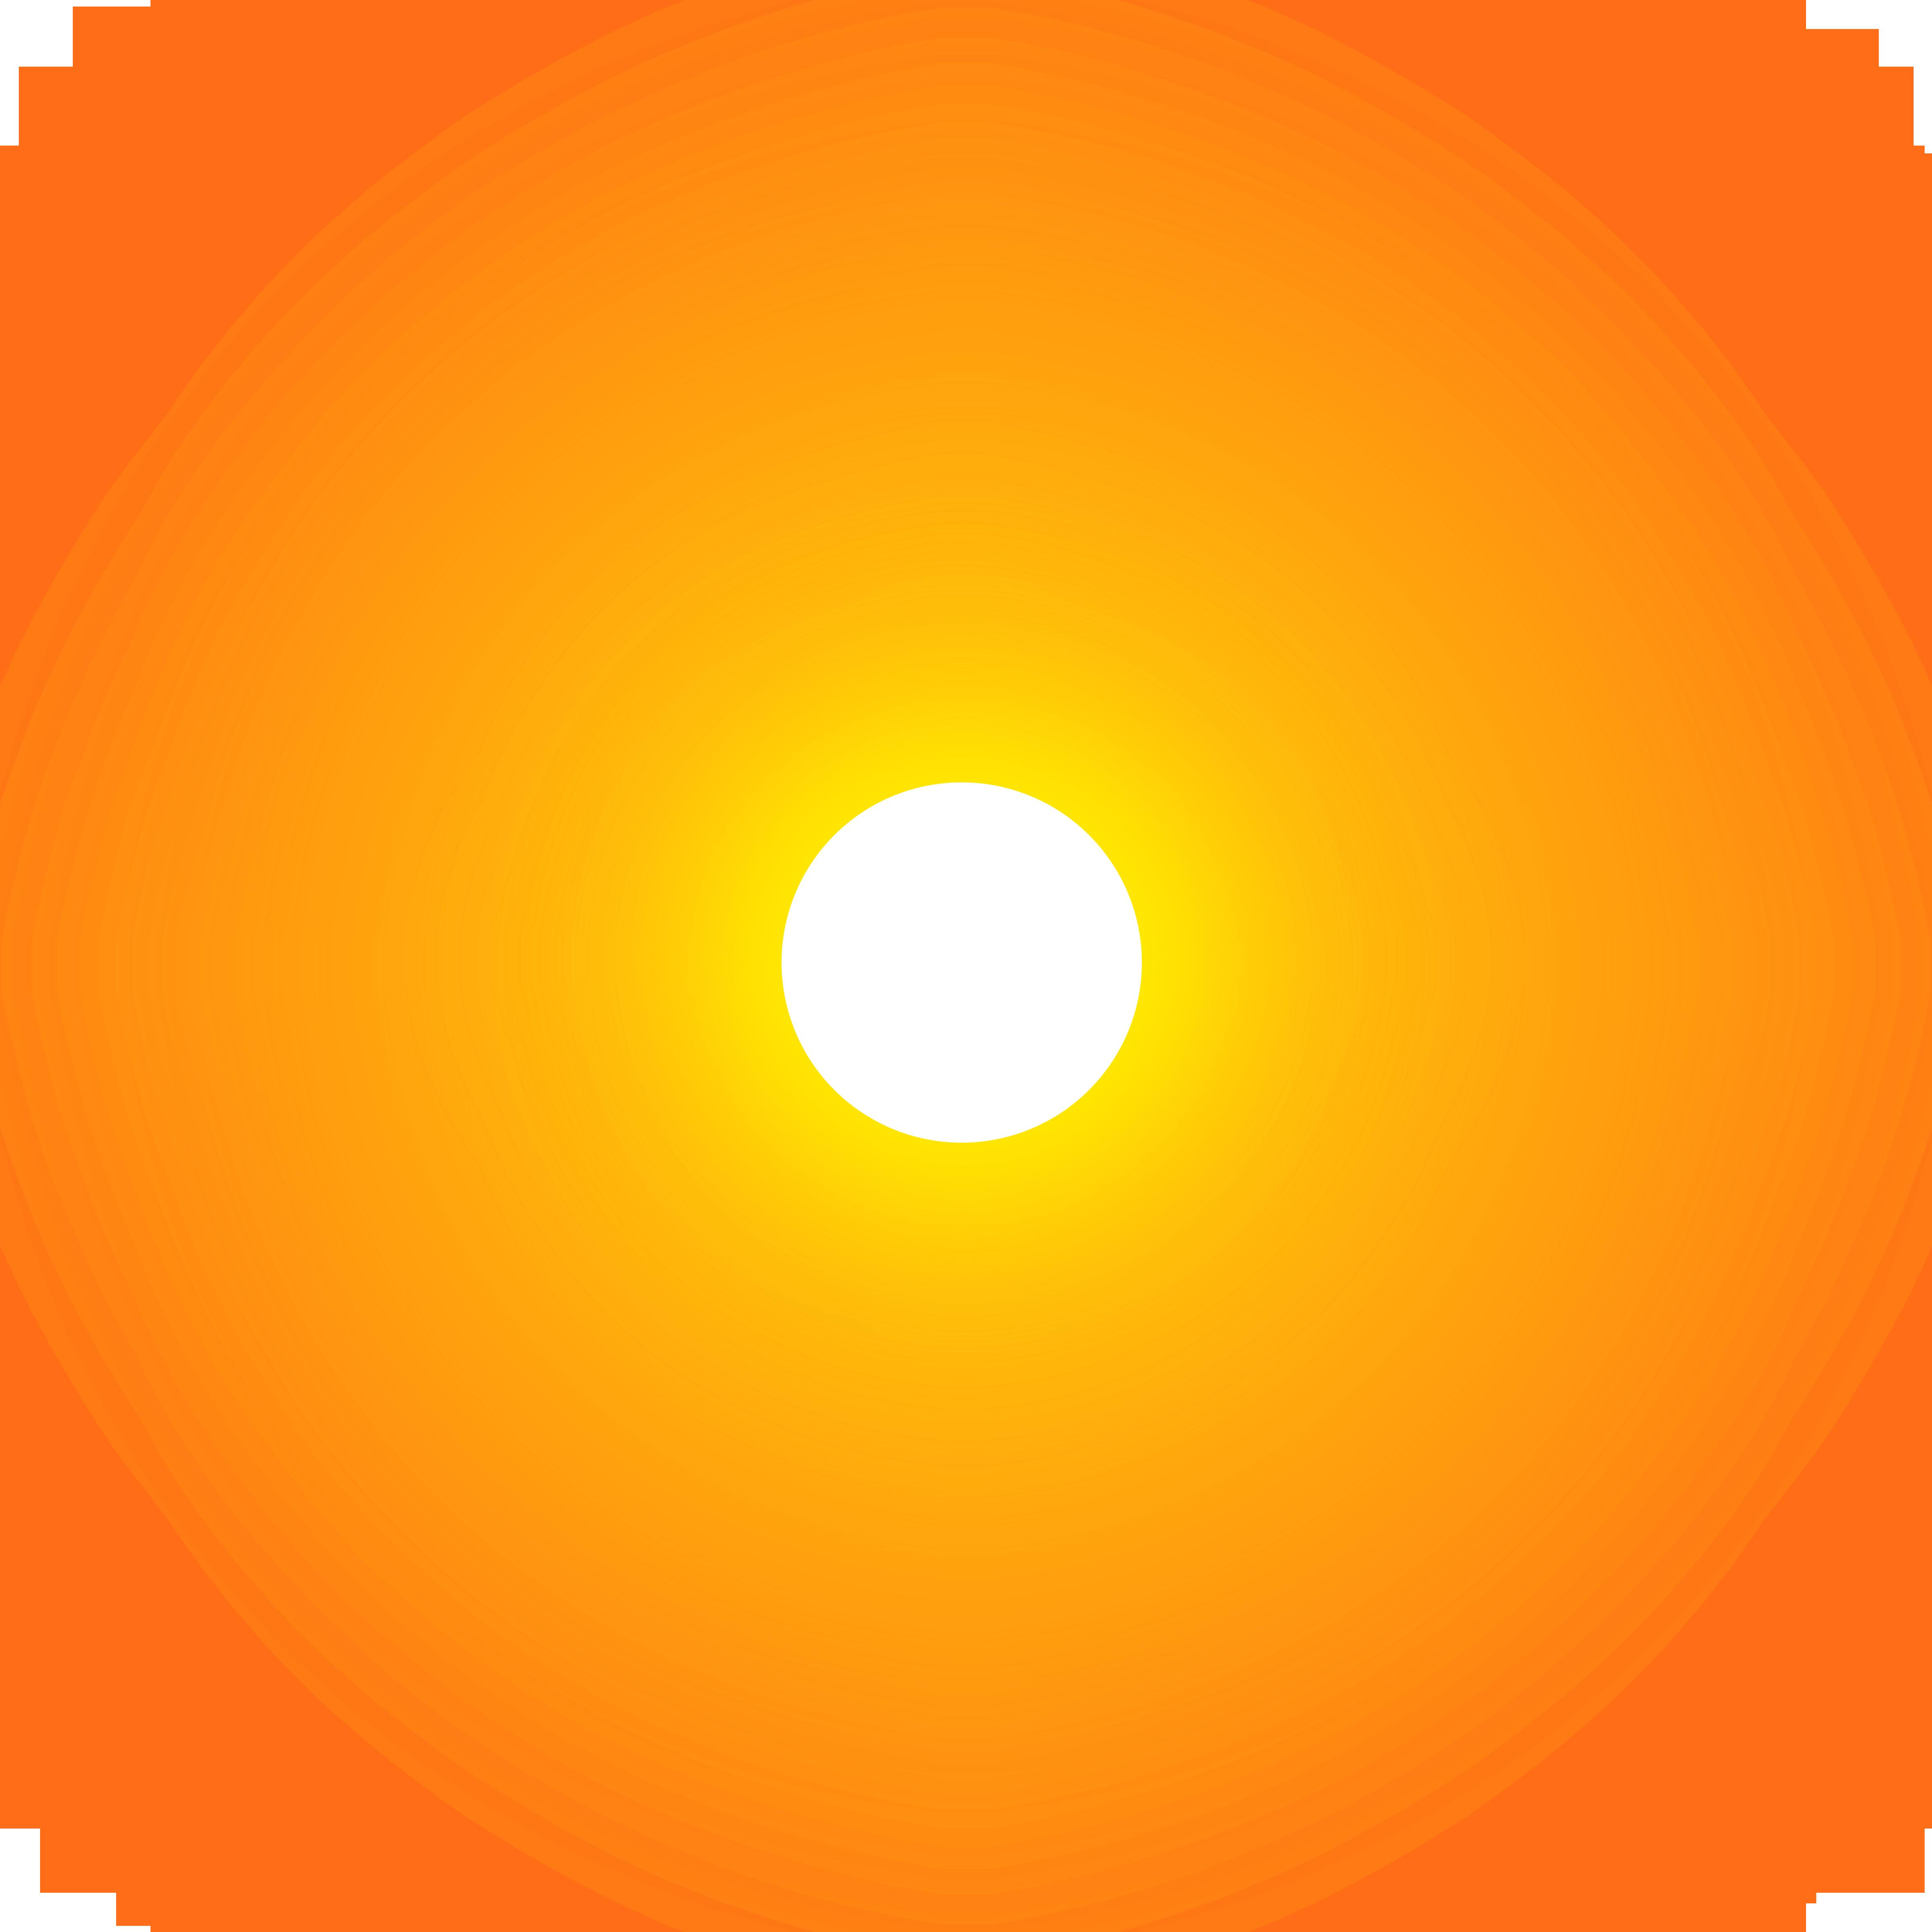 Sun PNG Image - PurePNG   Free transparent CC0 PNG Image ...